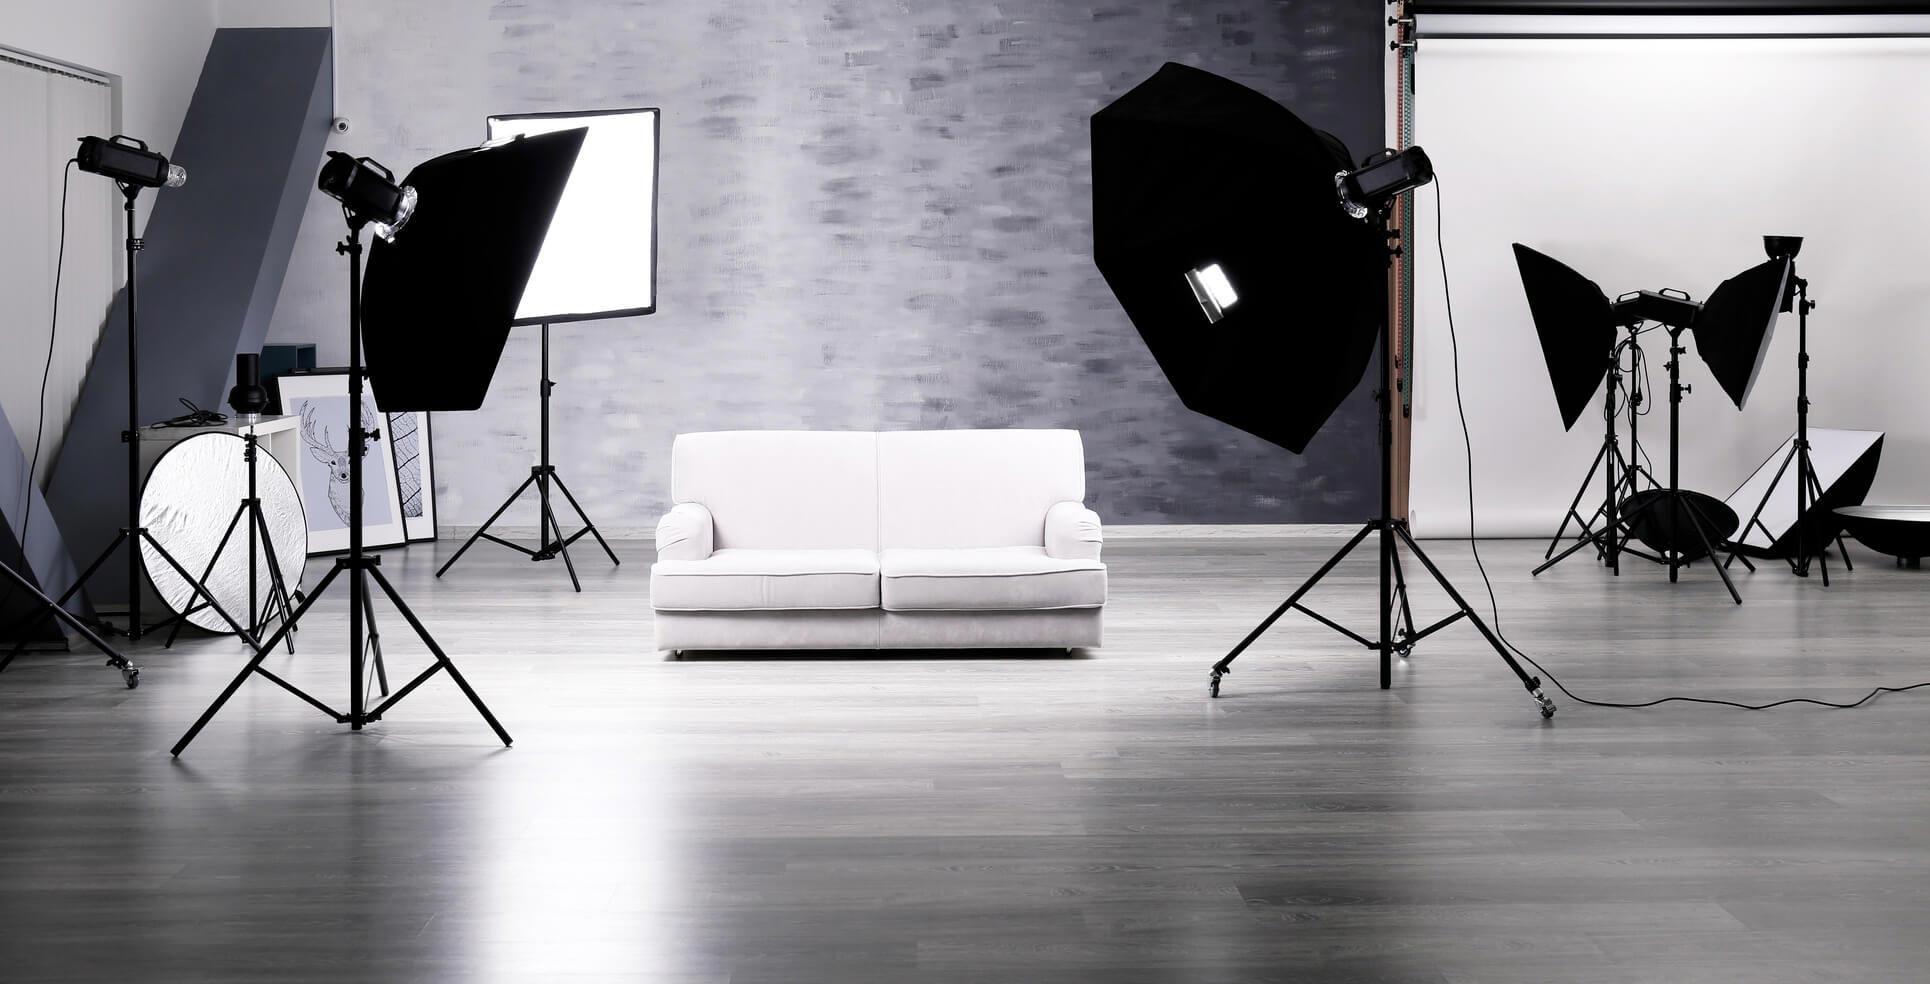 lighting in studio - نورپردازی در عکاسی